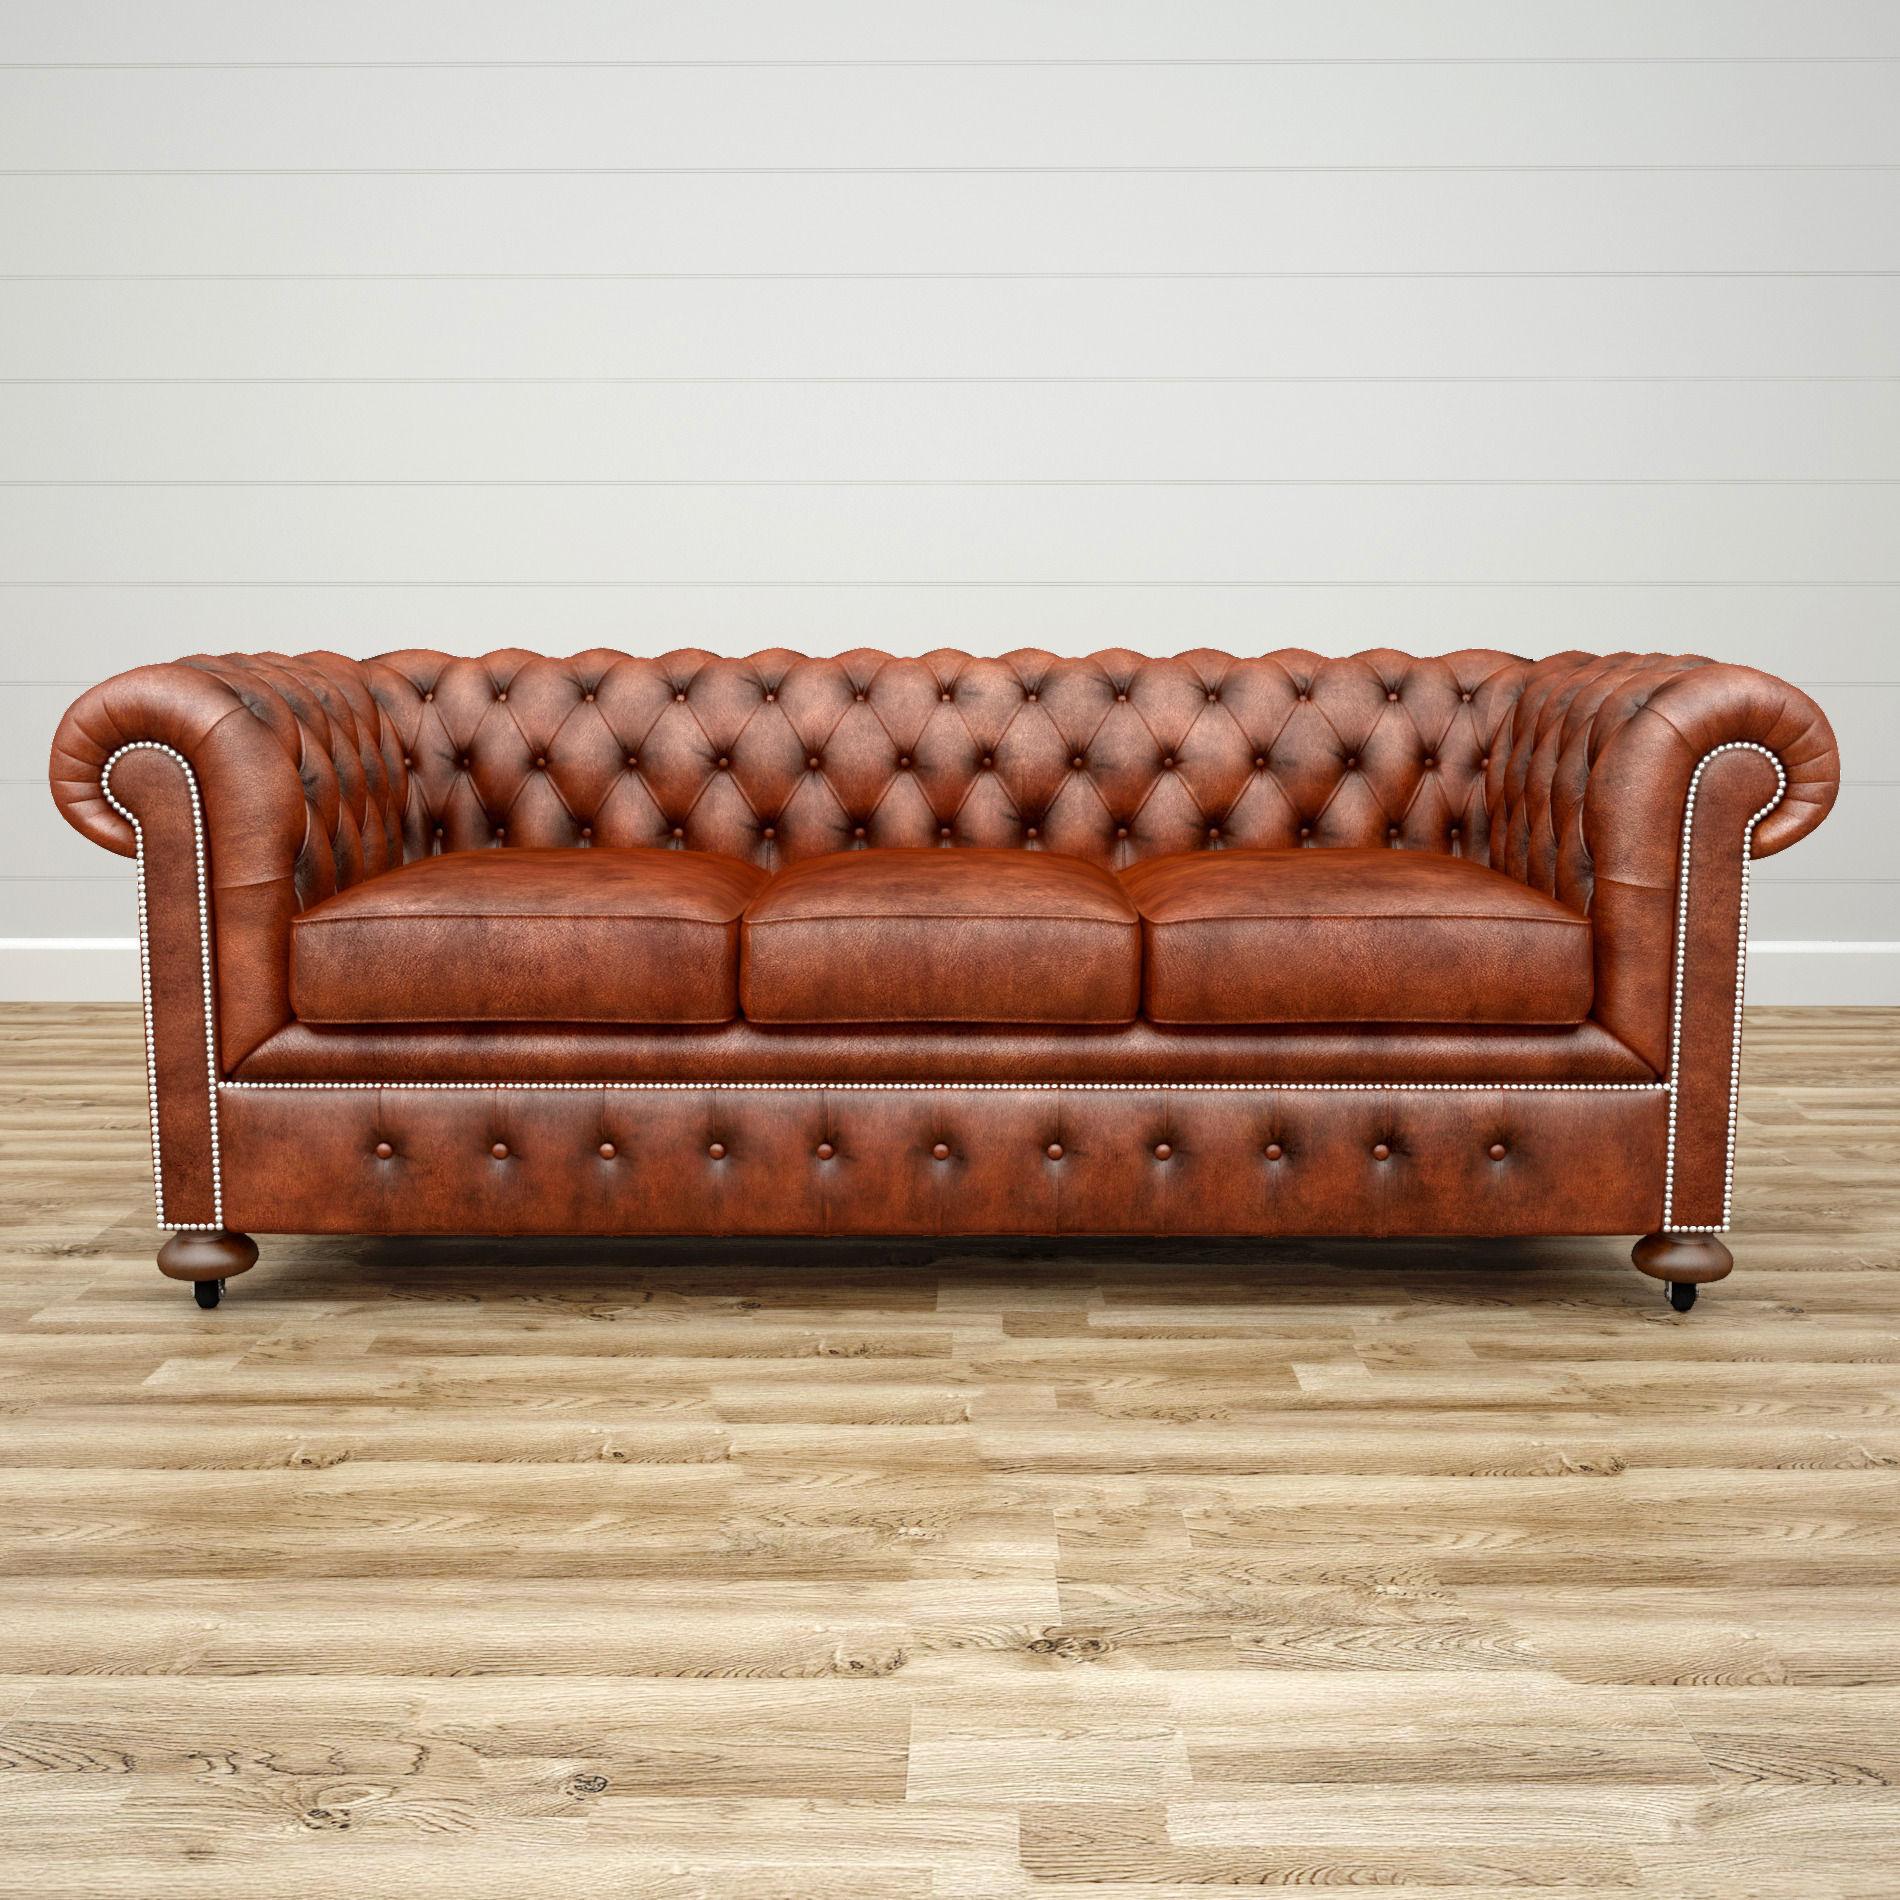 3D William Blake Chesterfield Sofa